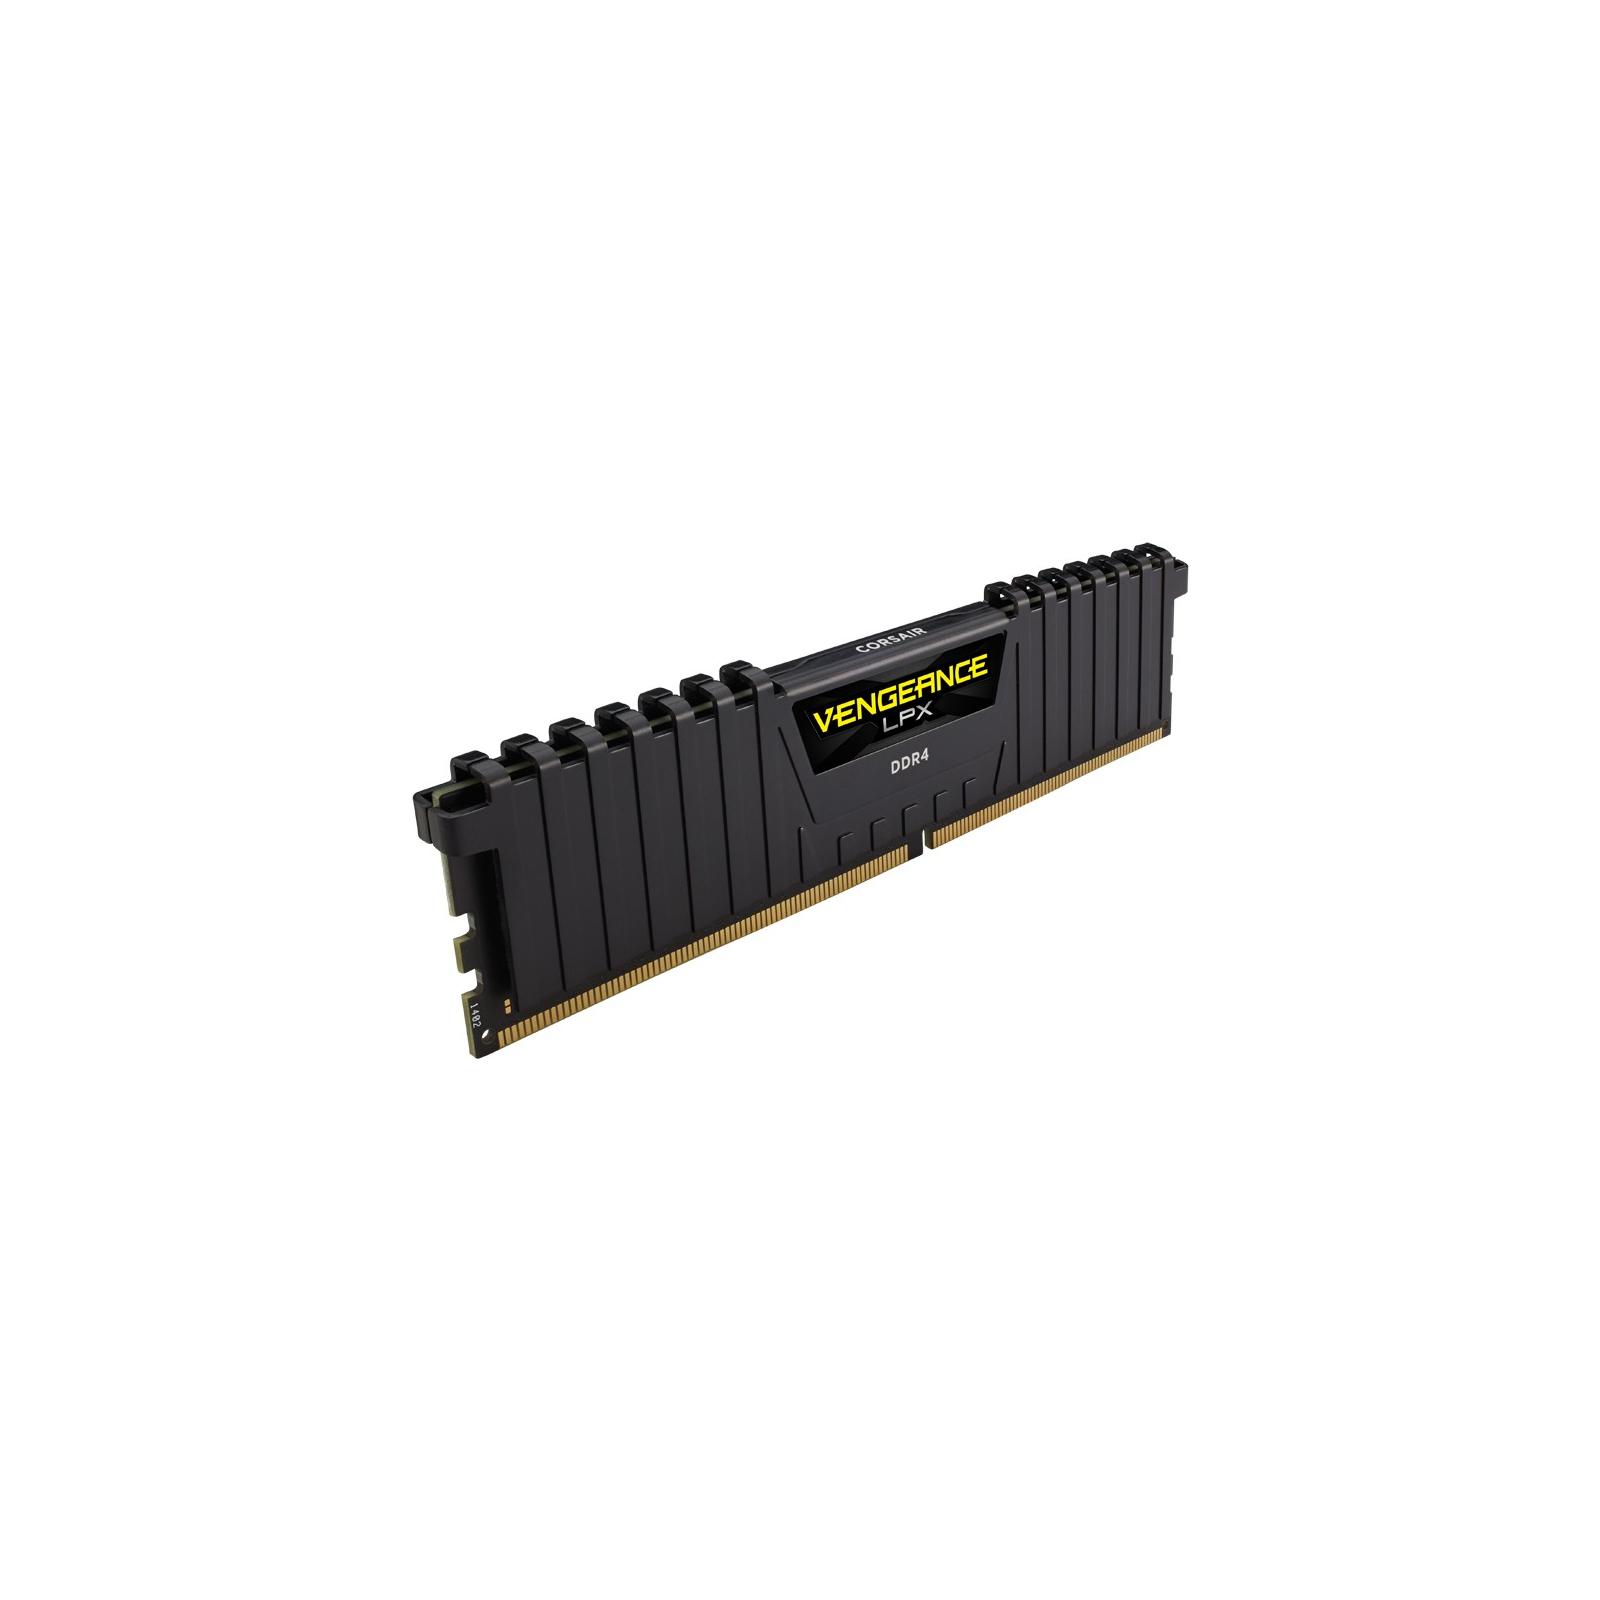 Модуль памяти для компьютера DDR4 8GB 2666 MHz Vengeance LPX Black CORSAIR (CMK8GX4M1A2666C16) изображение 3